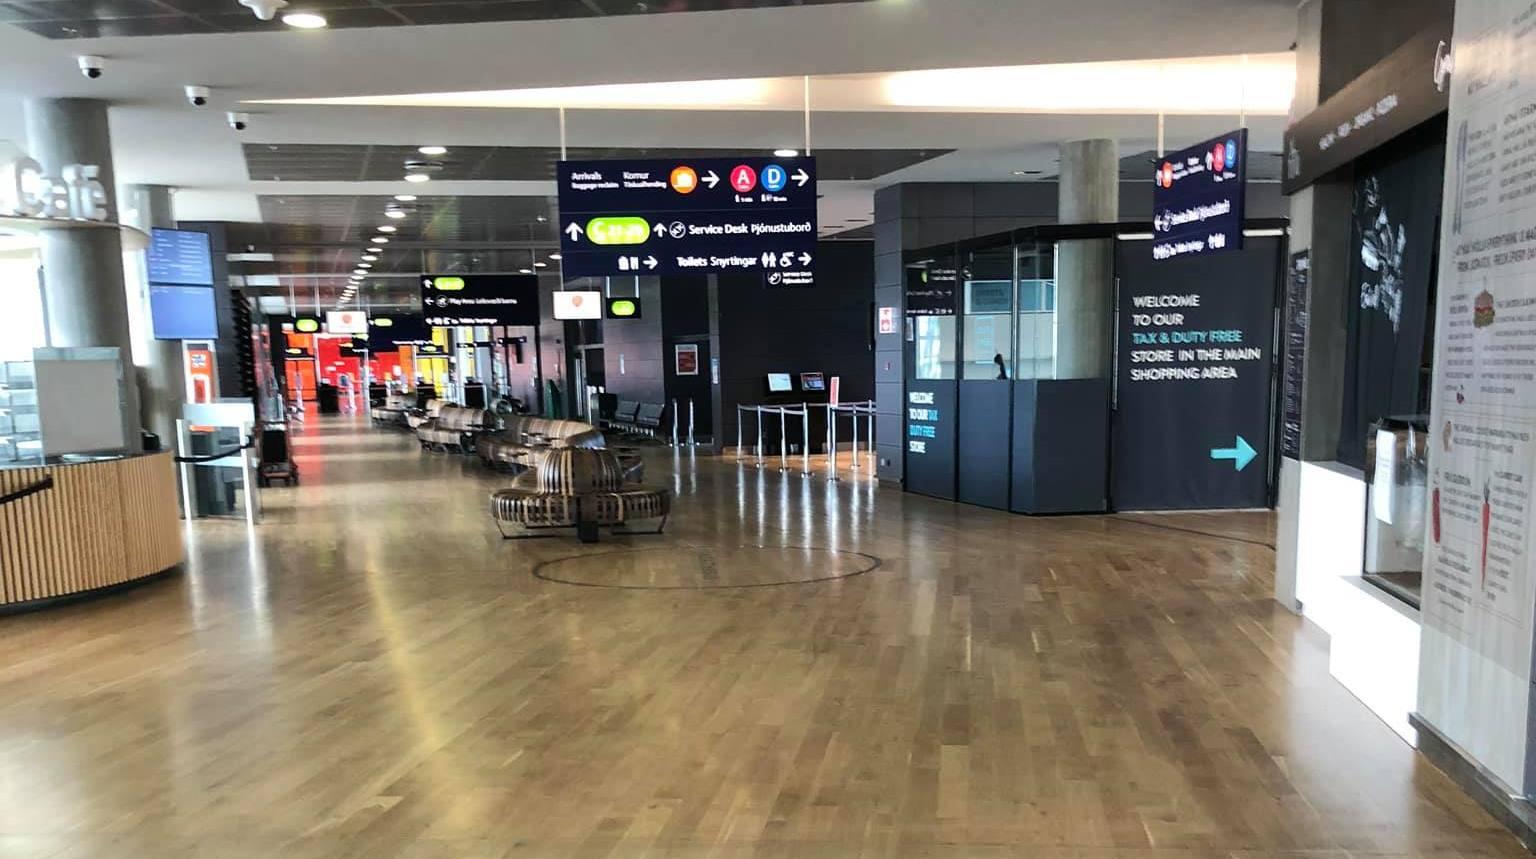 Tomme terminaler i Keflavik International Airport under COVID-19-pandemien. (Privatfoto)